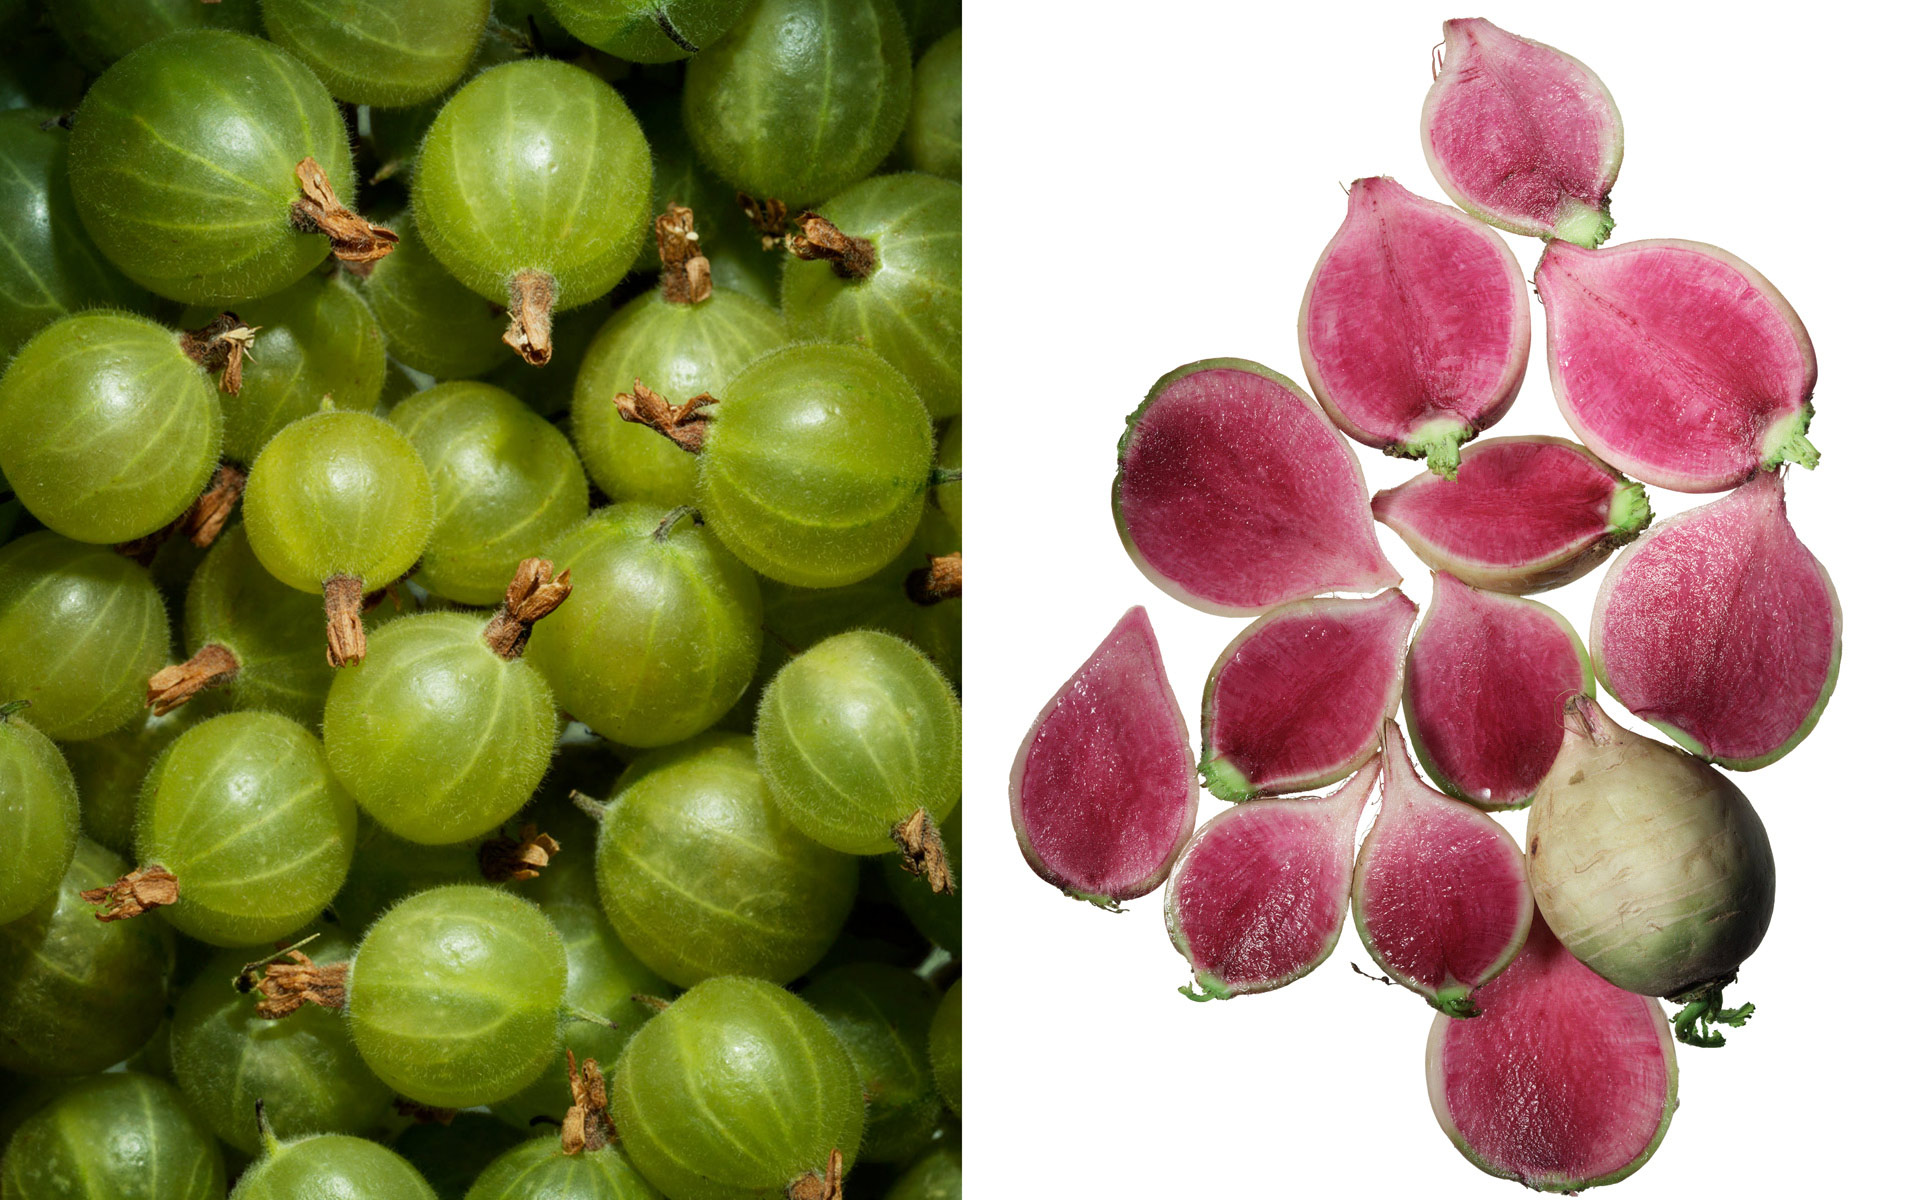 PR_grapes-radishs_sq.jpg